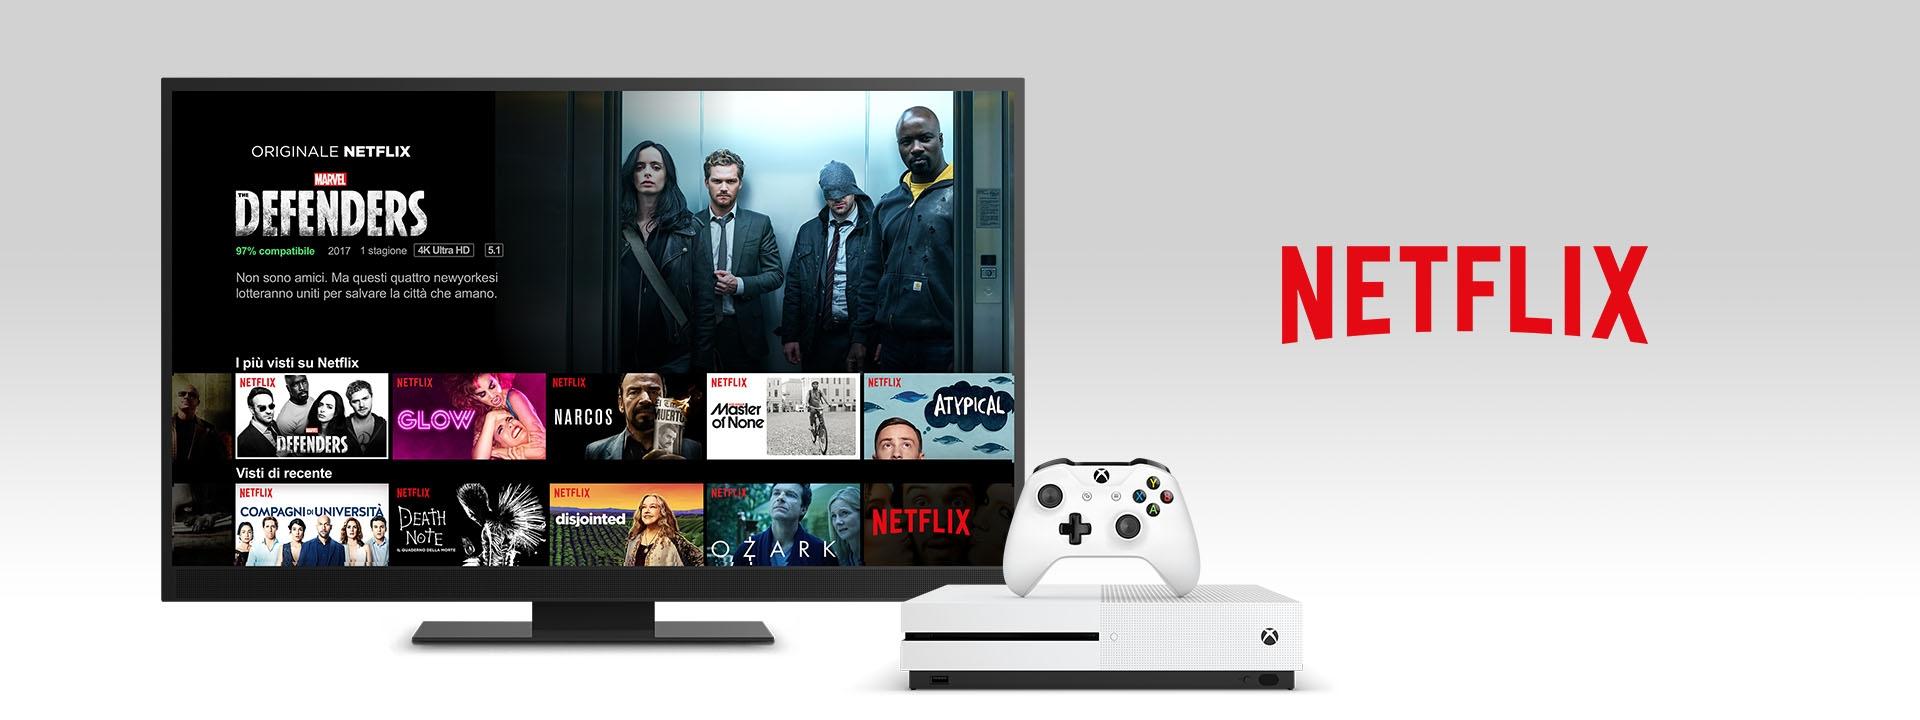 Netflix su Xbox One